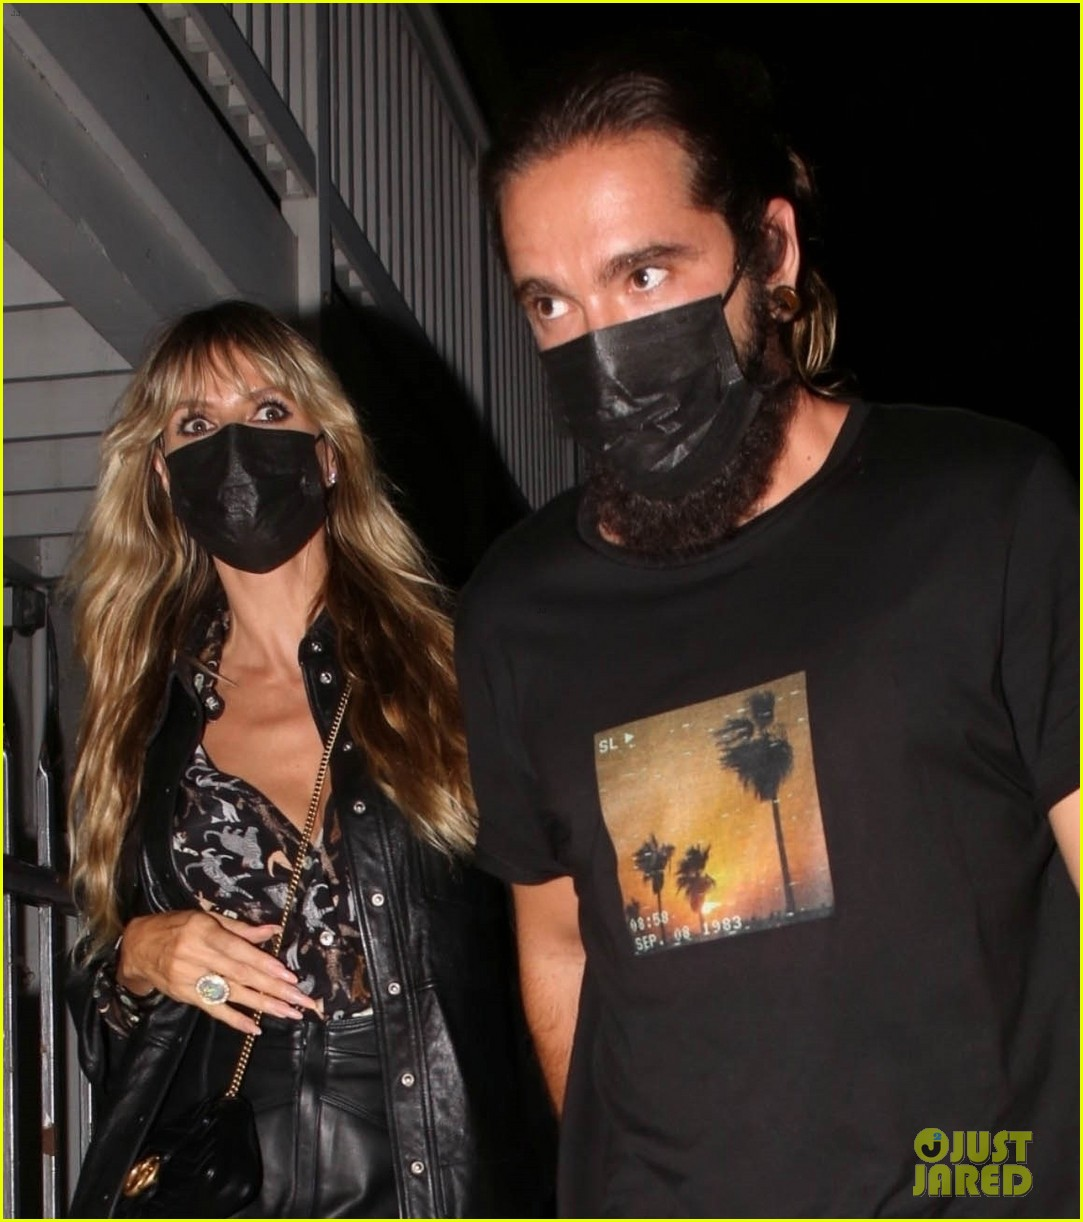 heidi klum date night with husband tom kaulitz 044581184